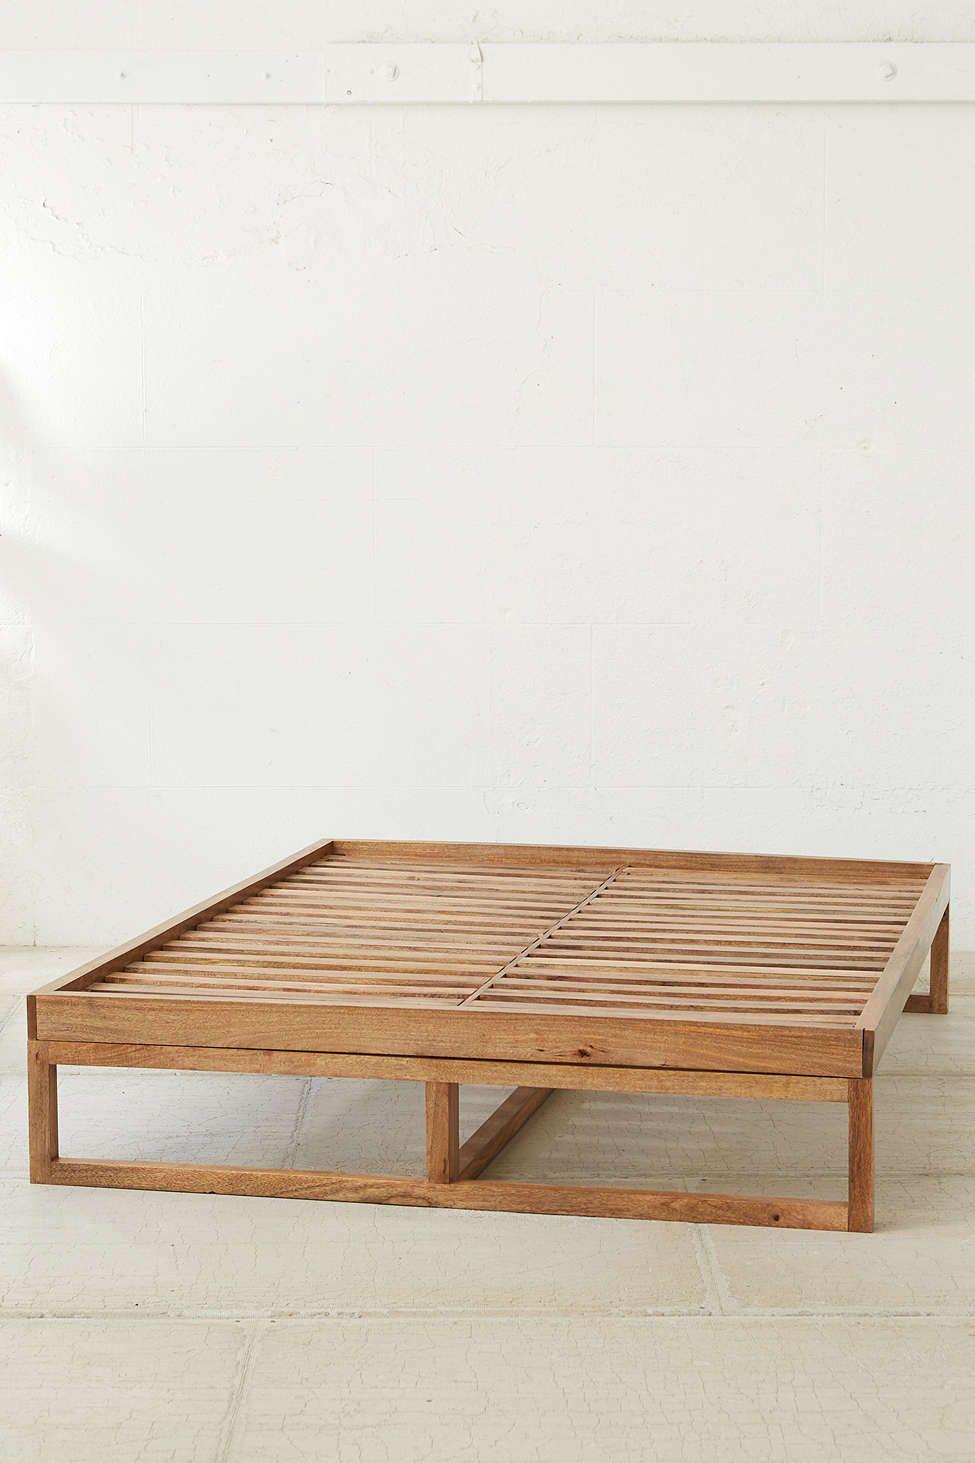 Full Size of Japanisches Bett Tatami Bed Mat 90 Cm Authentic Japanese Style Rauch Betten 140x200 Nolte Mädchen 200x200 Massiv 180x200 Mit Gepolstertem Kopfteil 120x190 Bett Japanisches Bett